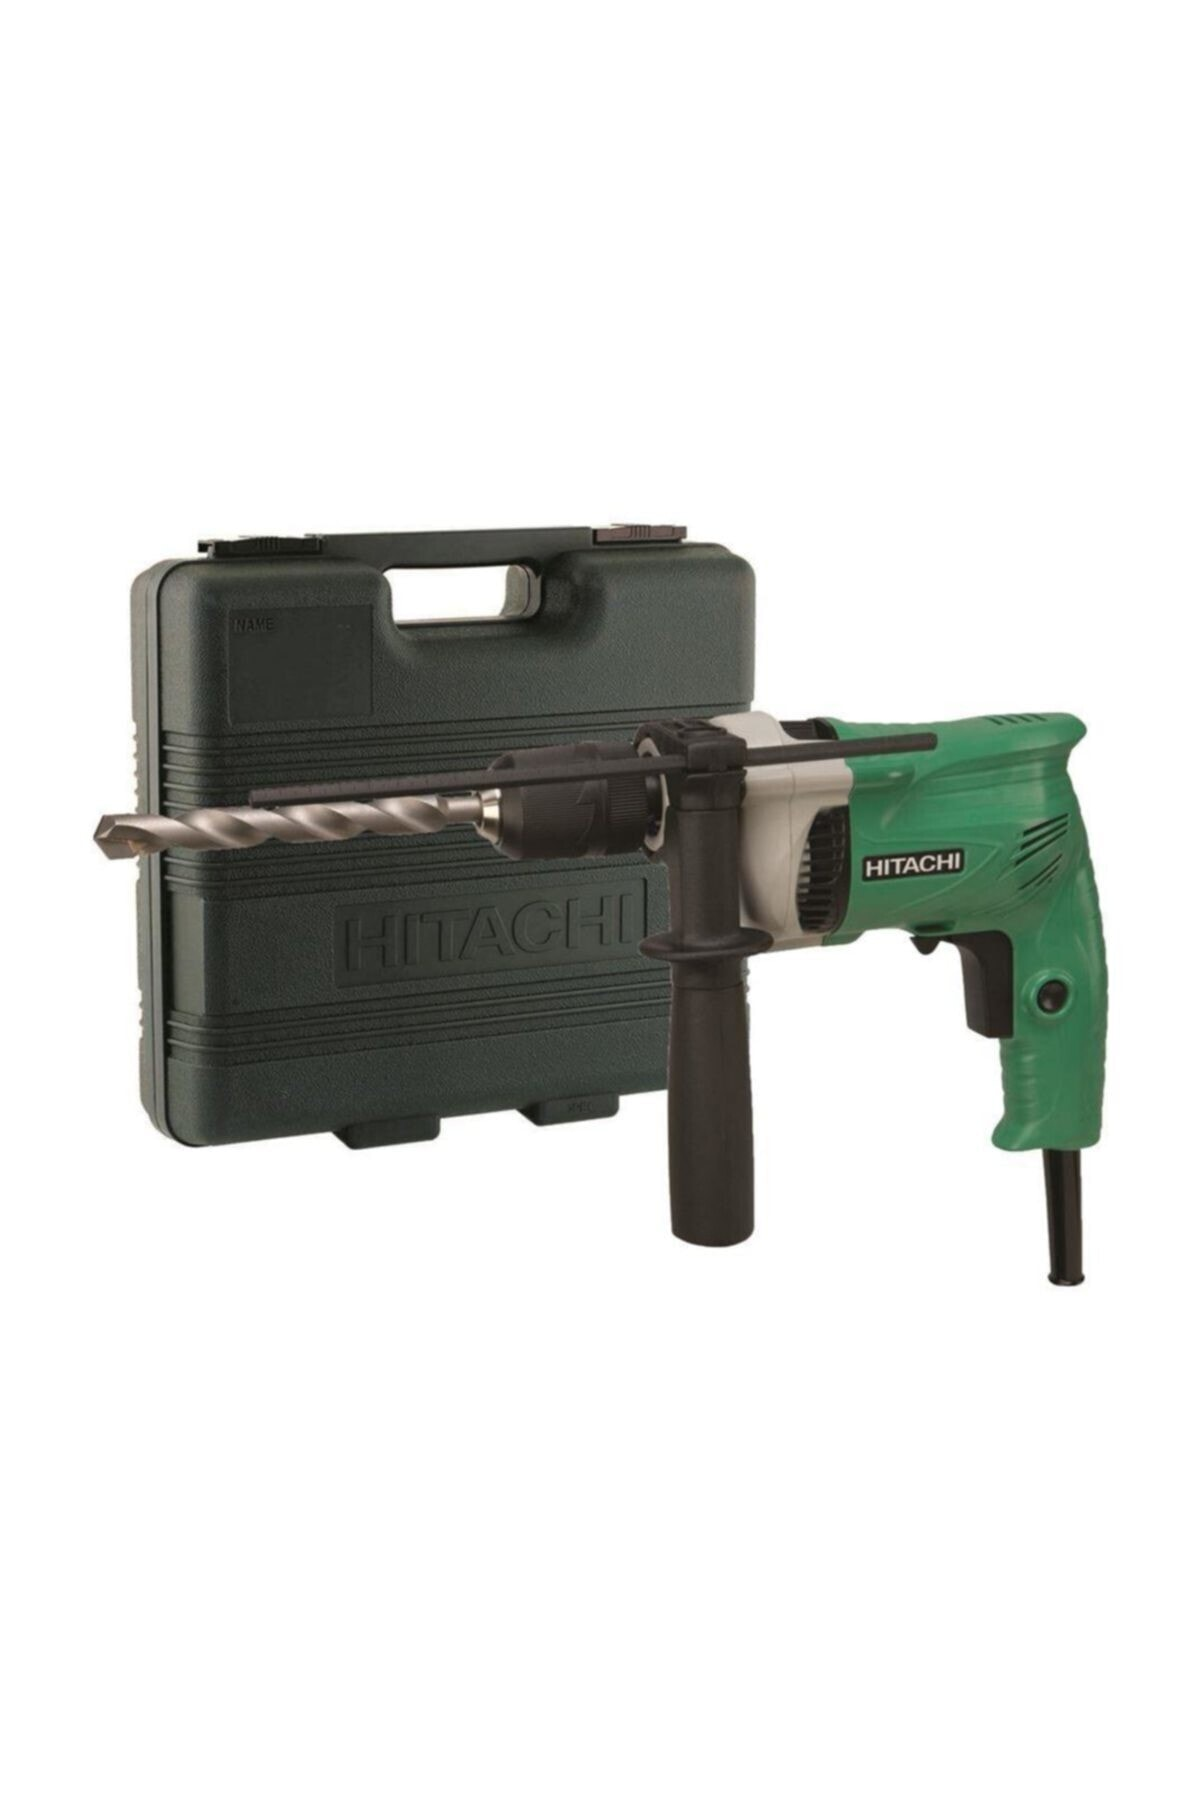 HITACHI Darbeli Matkap 600 w 13 mm Dv16Vss 1